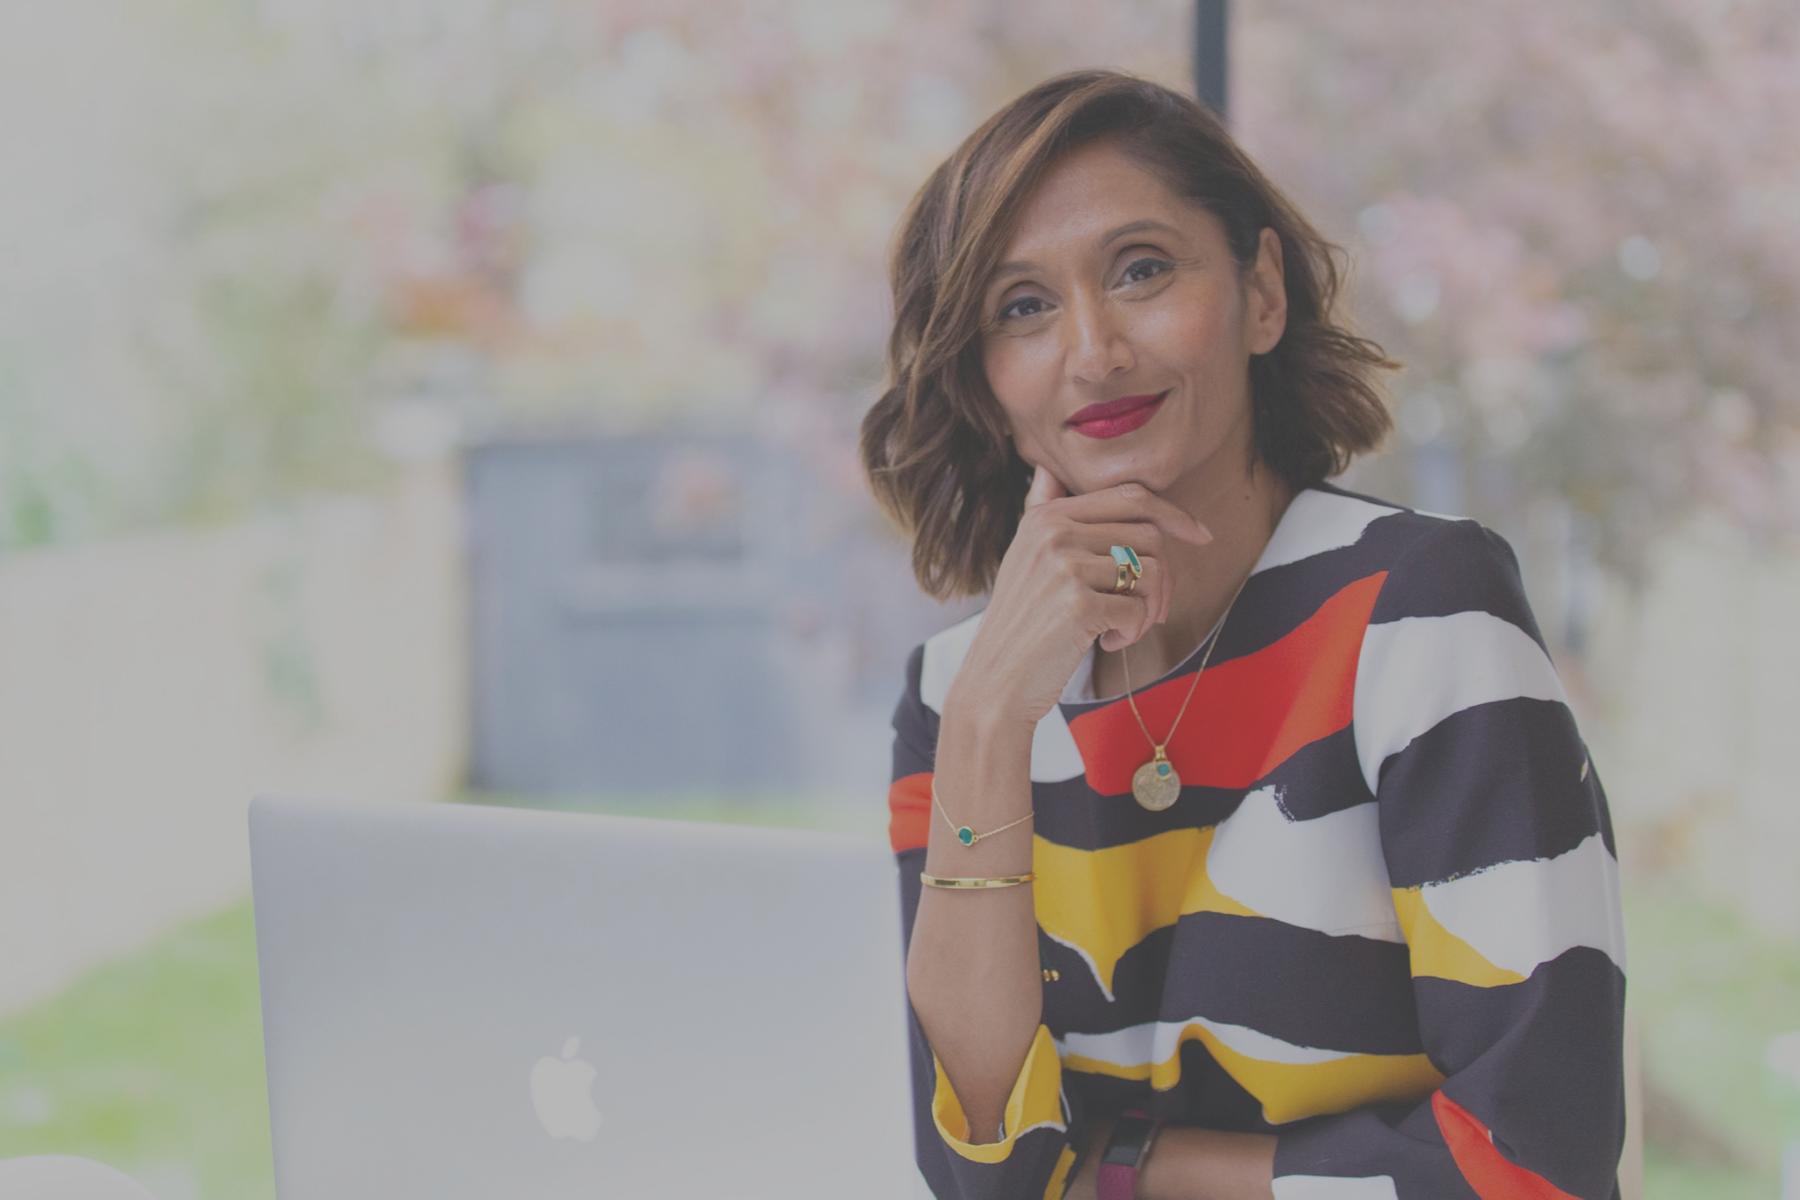 Binta Patel Life Coaching